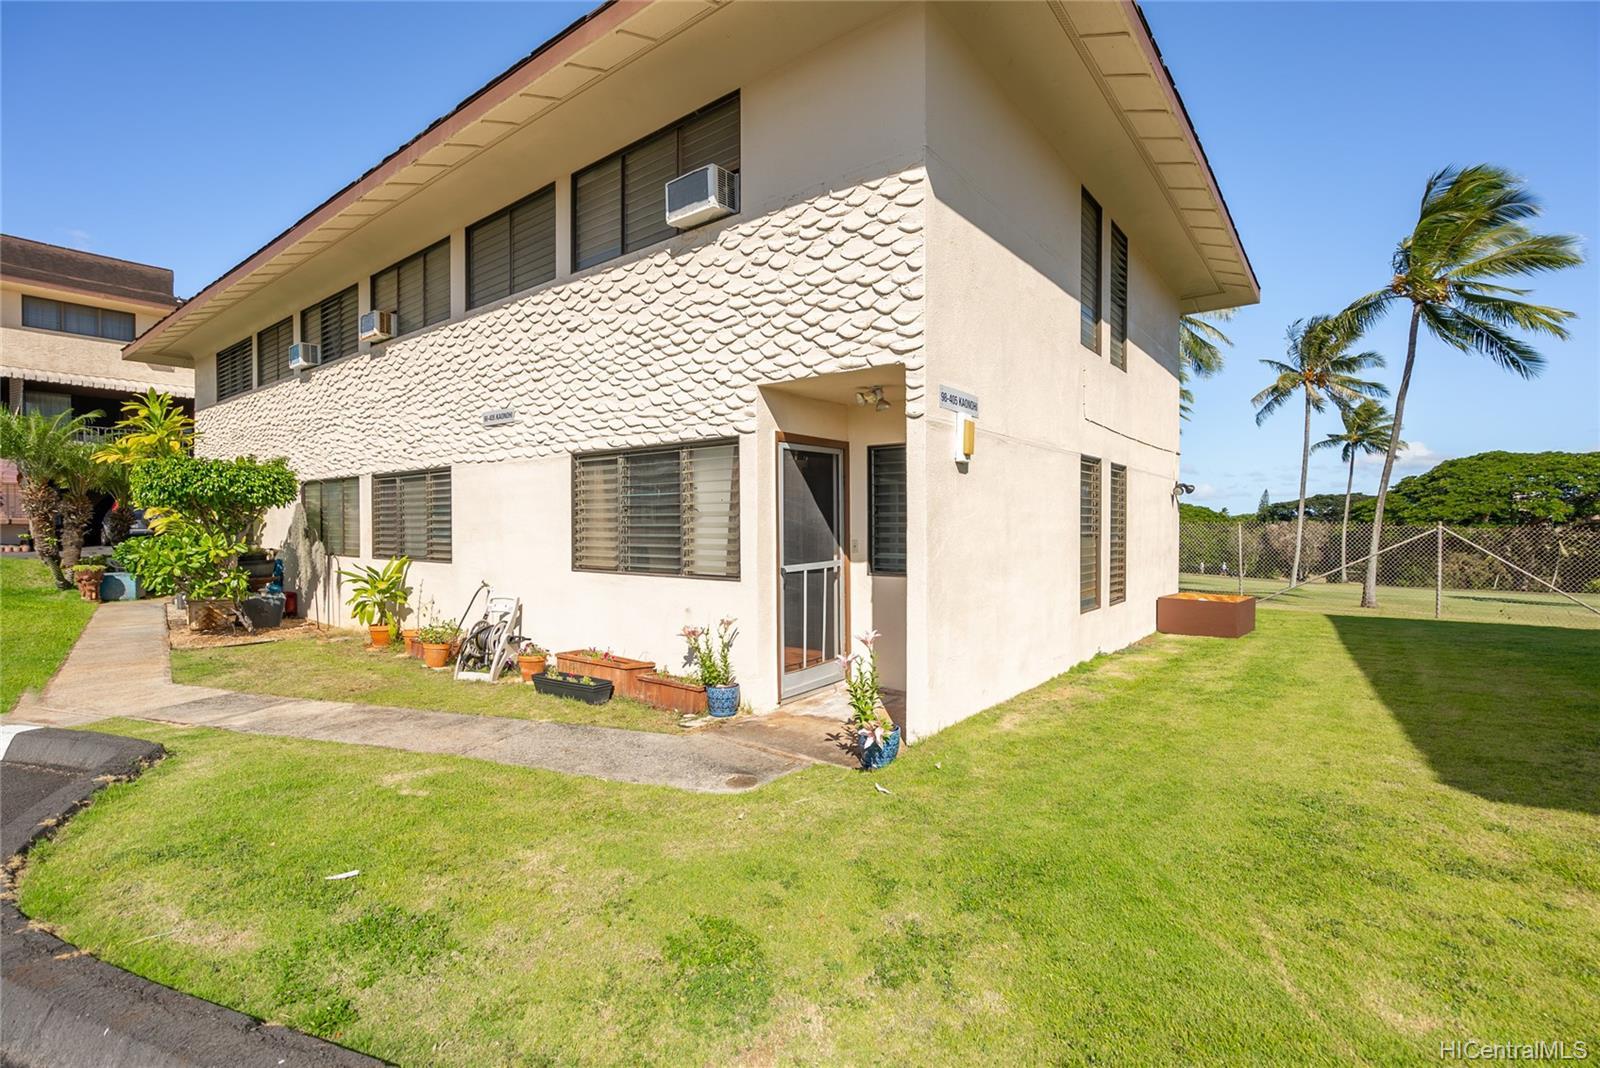 98-405 Kaonohi Street townhouse # 24/2, Aiea, Hawaii - photo 19 of 24